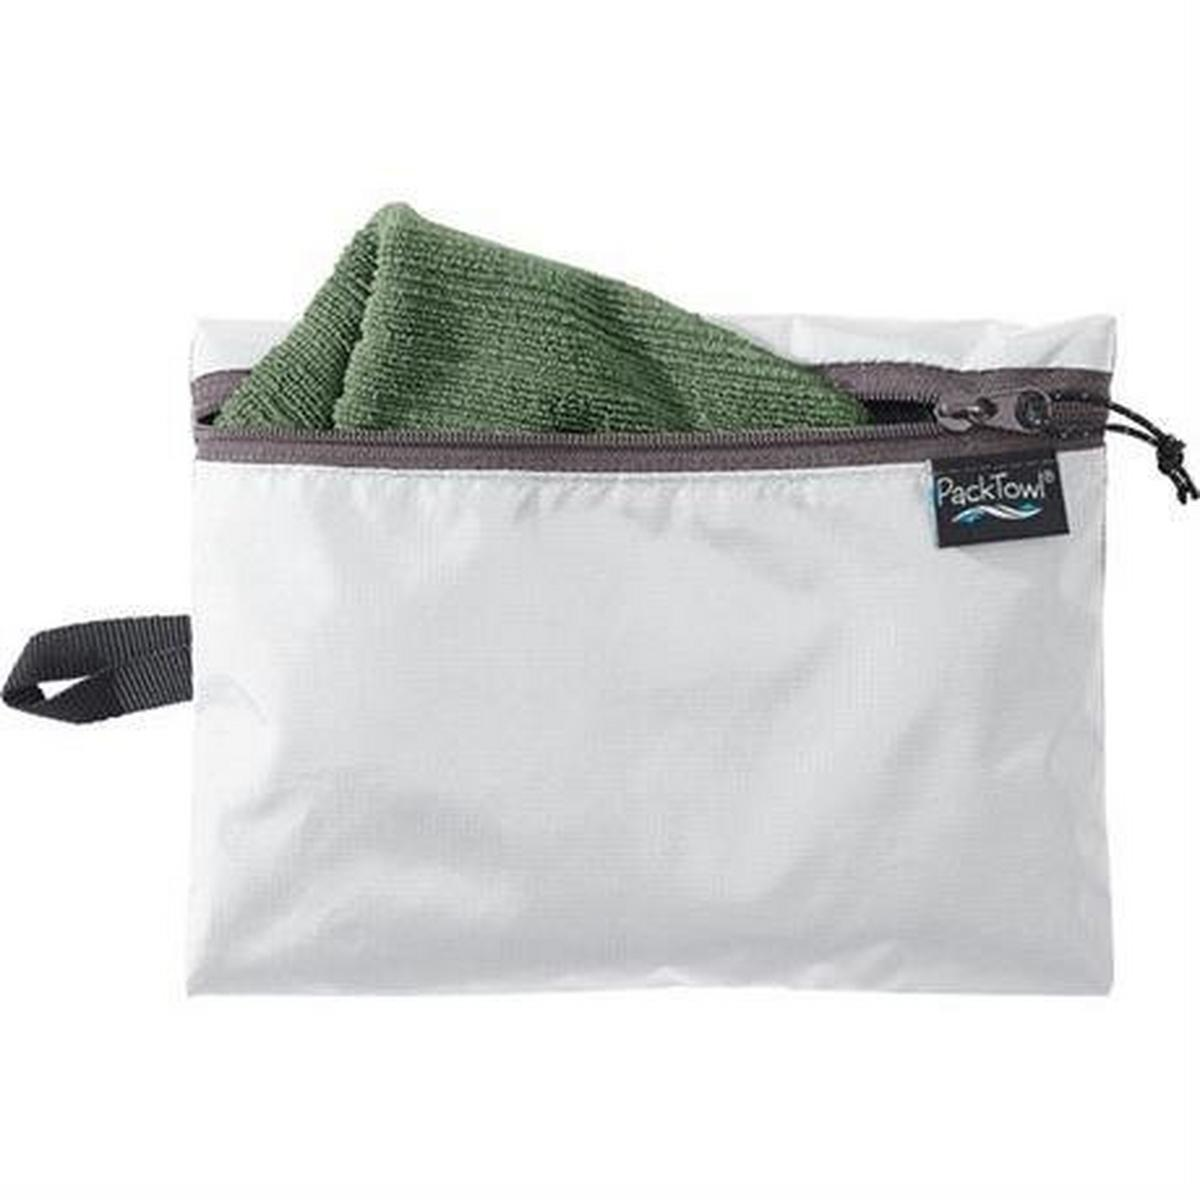 Packtowl Luxe Travel BODY Towel XL Deep Sea